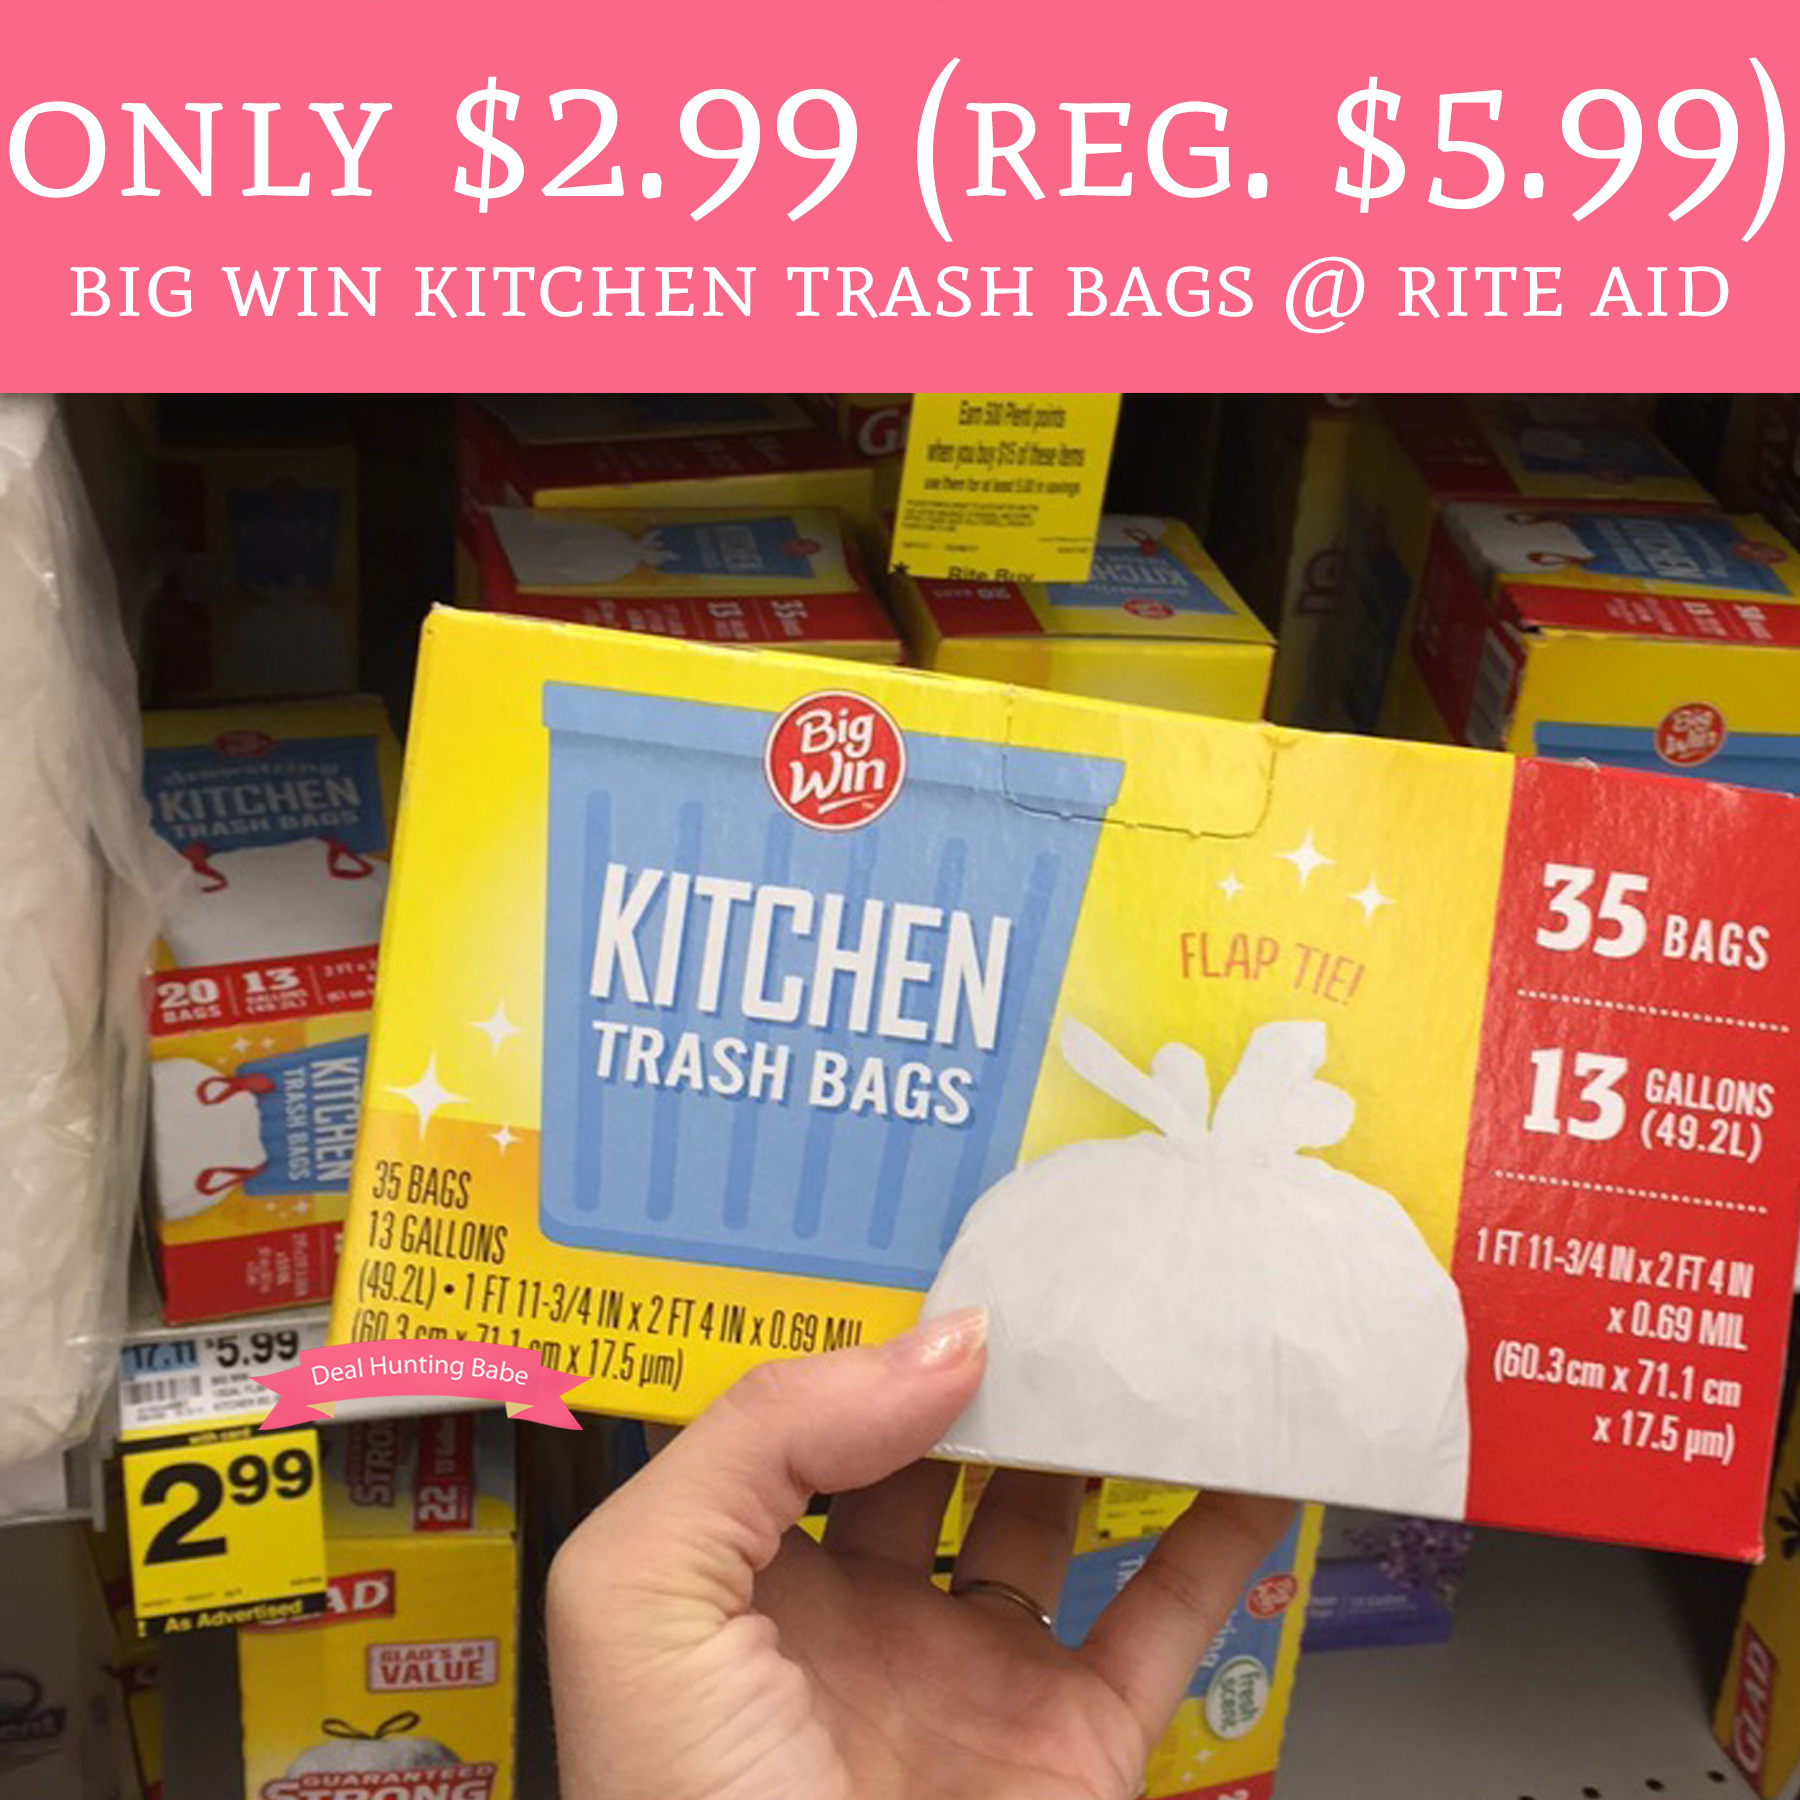 Only $2.99 (Regular $5.99) Big Wing Kitchen Trash Bags ...